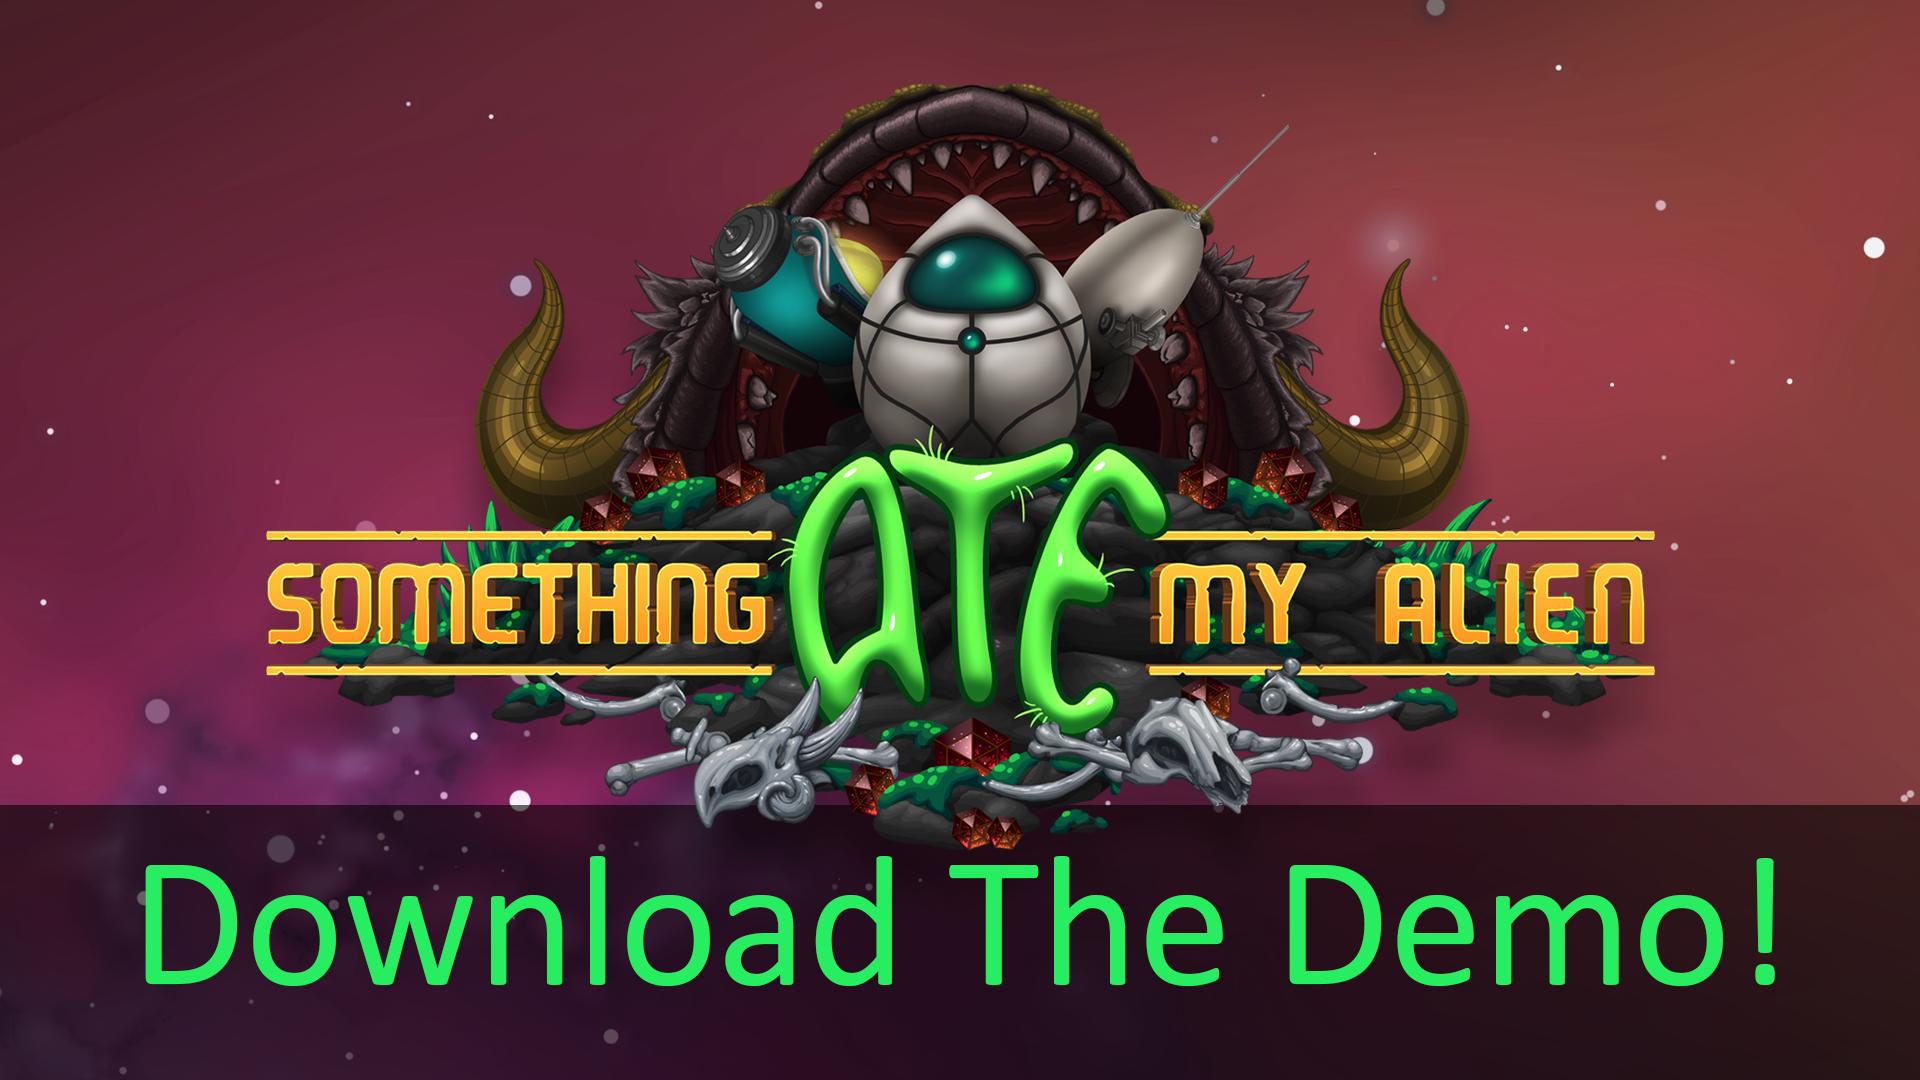 Download demo